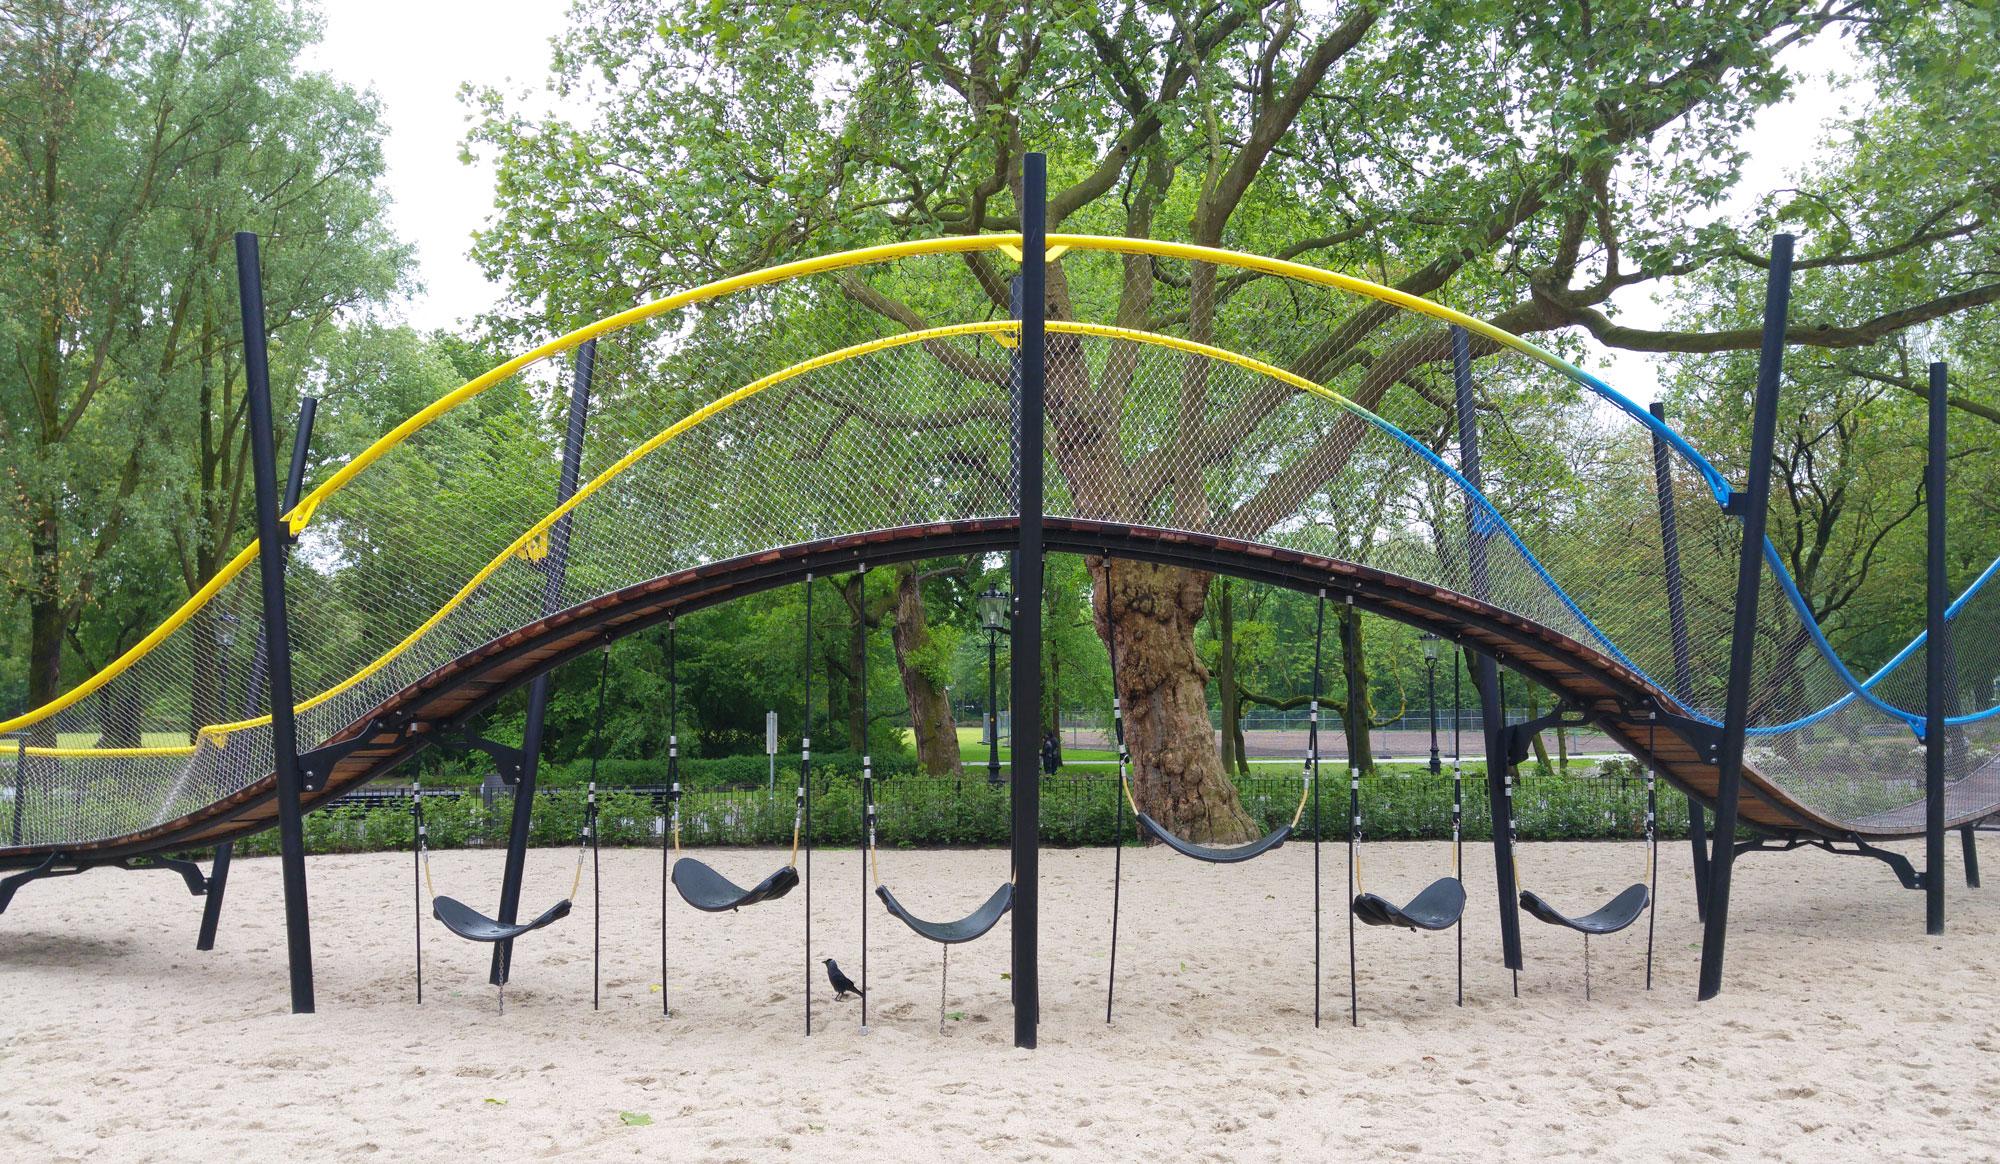 urbanbacklog-amsterdam-oosterpark-play-garland-3.jpg